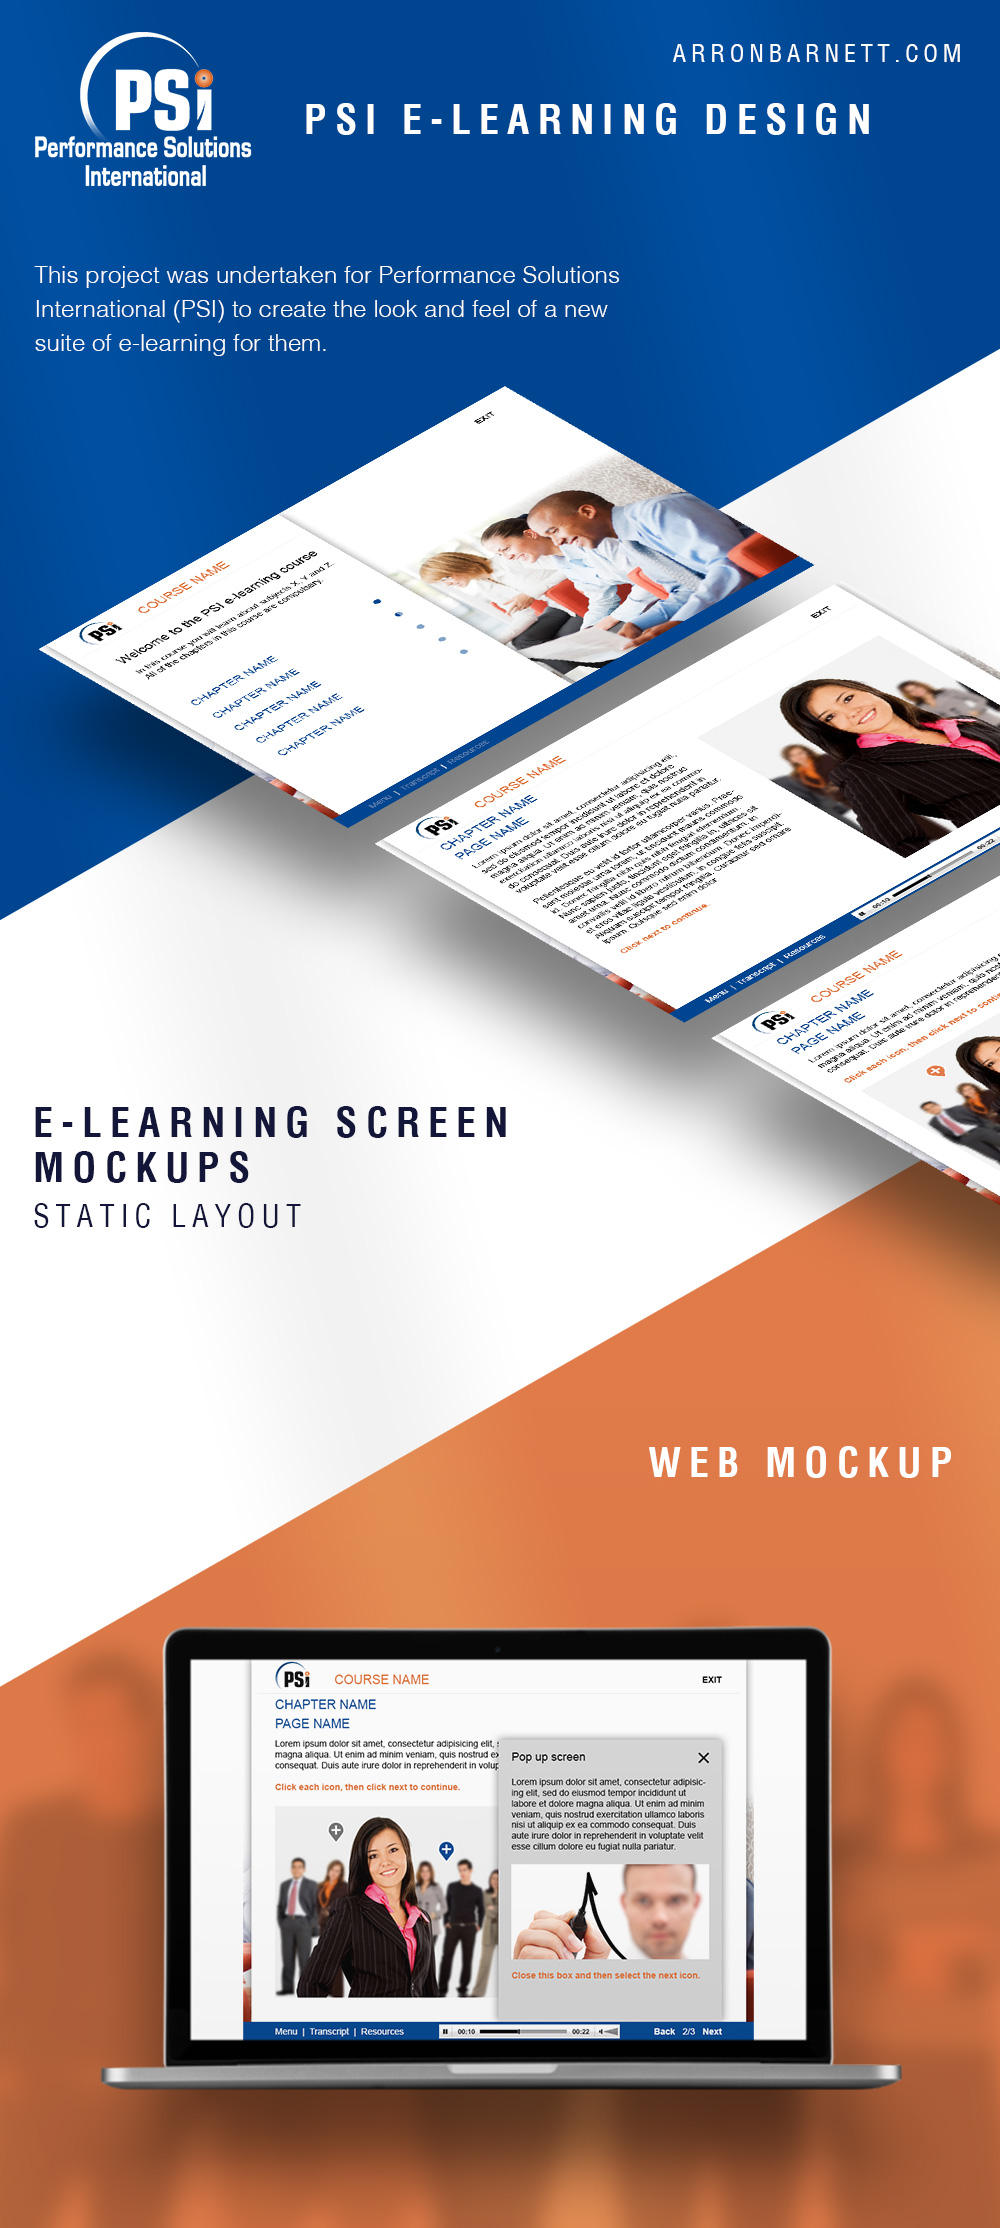 PSI E-Learning Design